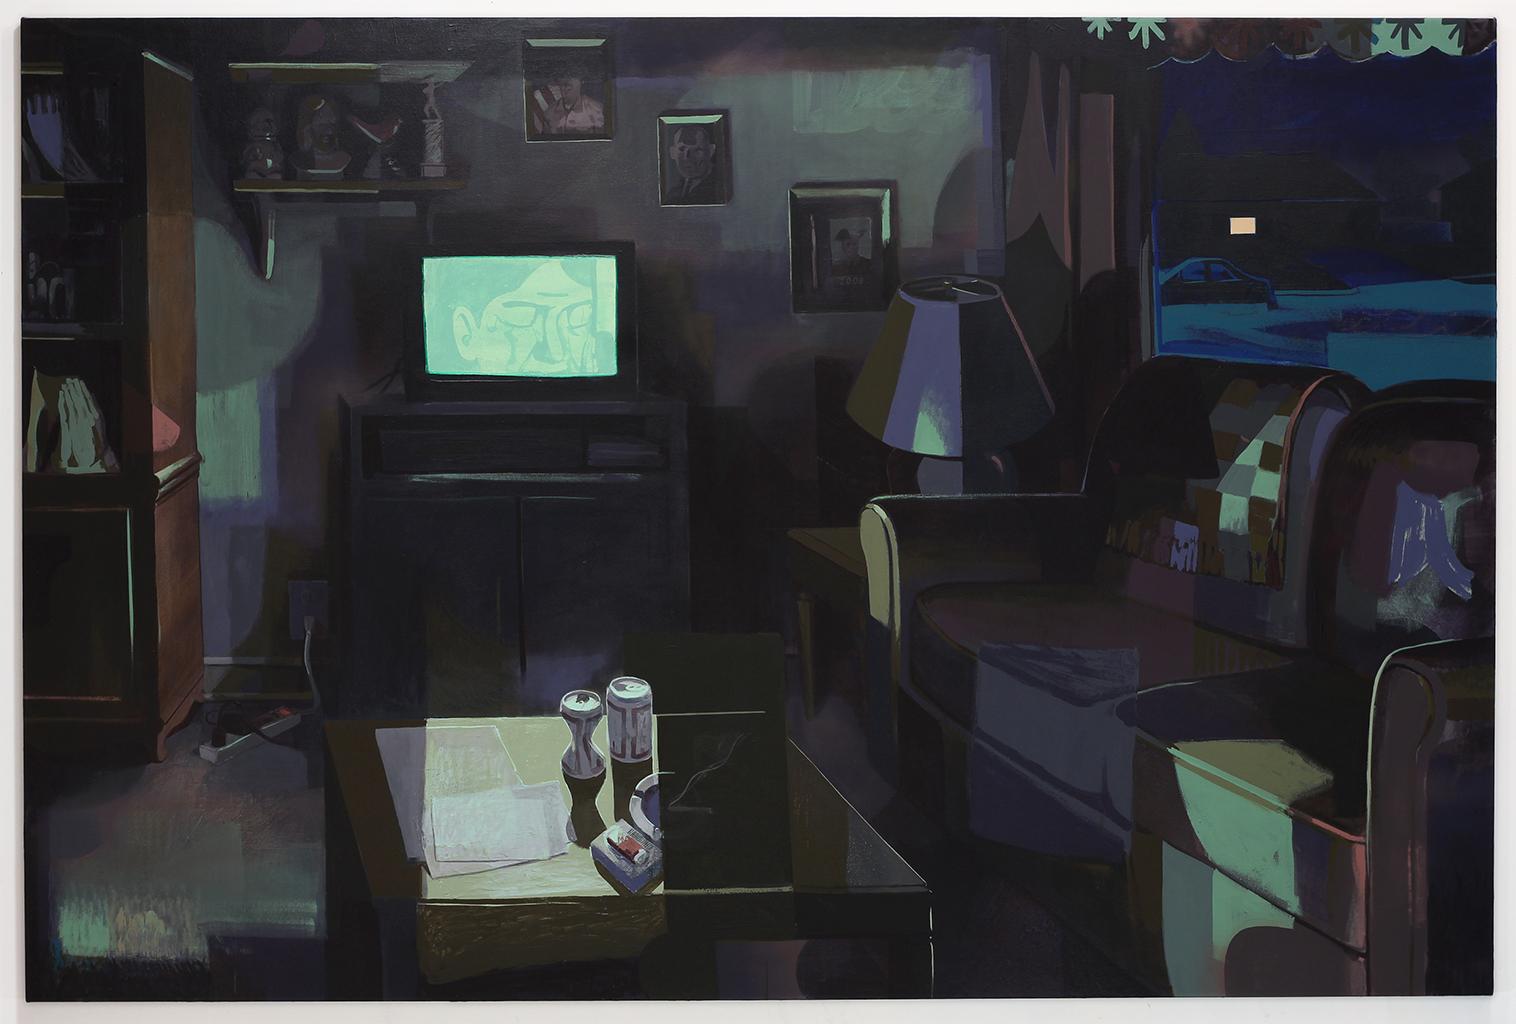 Living Room, Night